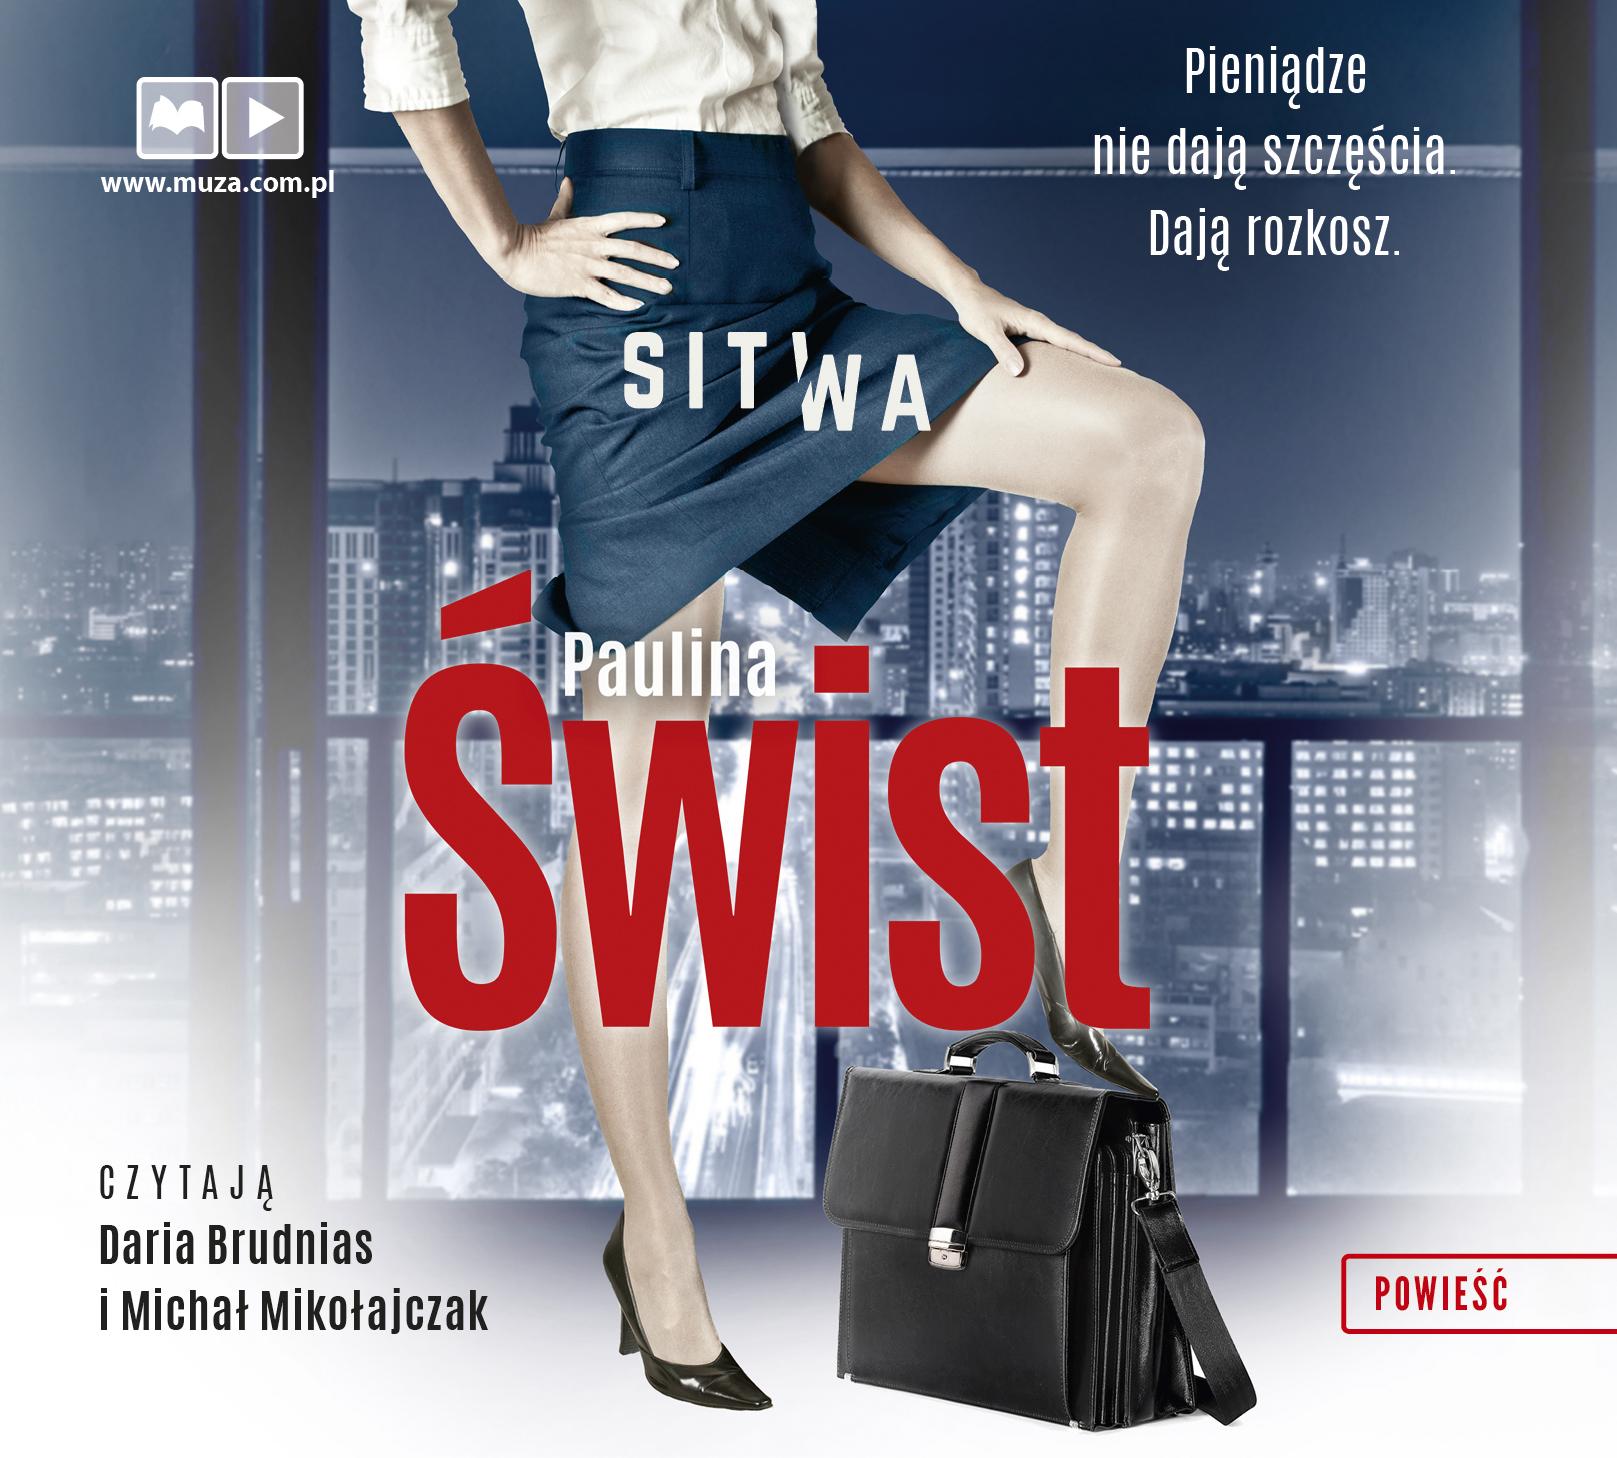 Świst Paulina – Sitwa